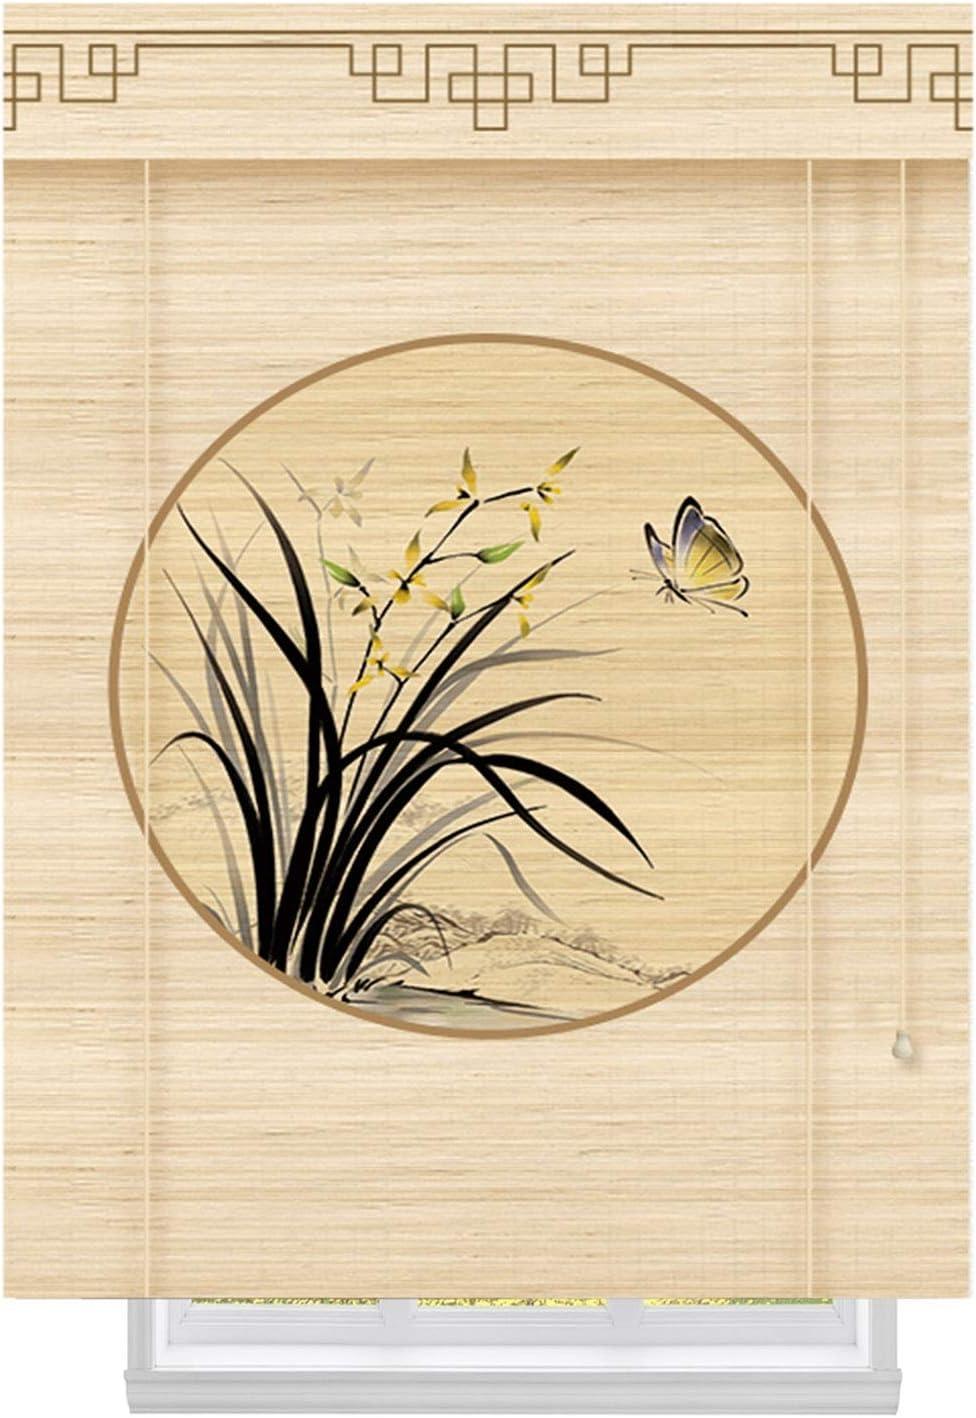 LIANGJUN Bamboo Curtain Roller Blind Window 3D Max 66% Ranking TOP7 OFF Pat Roman Shades